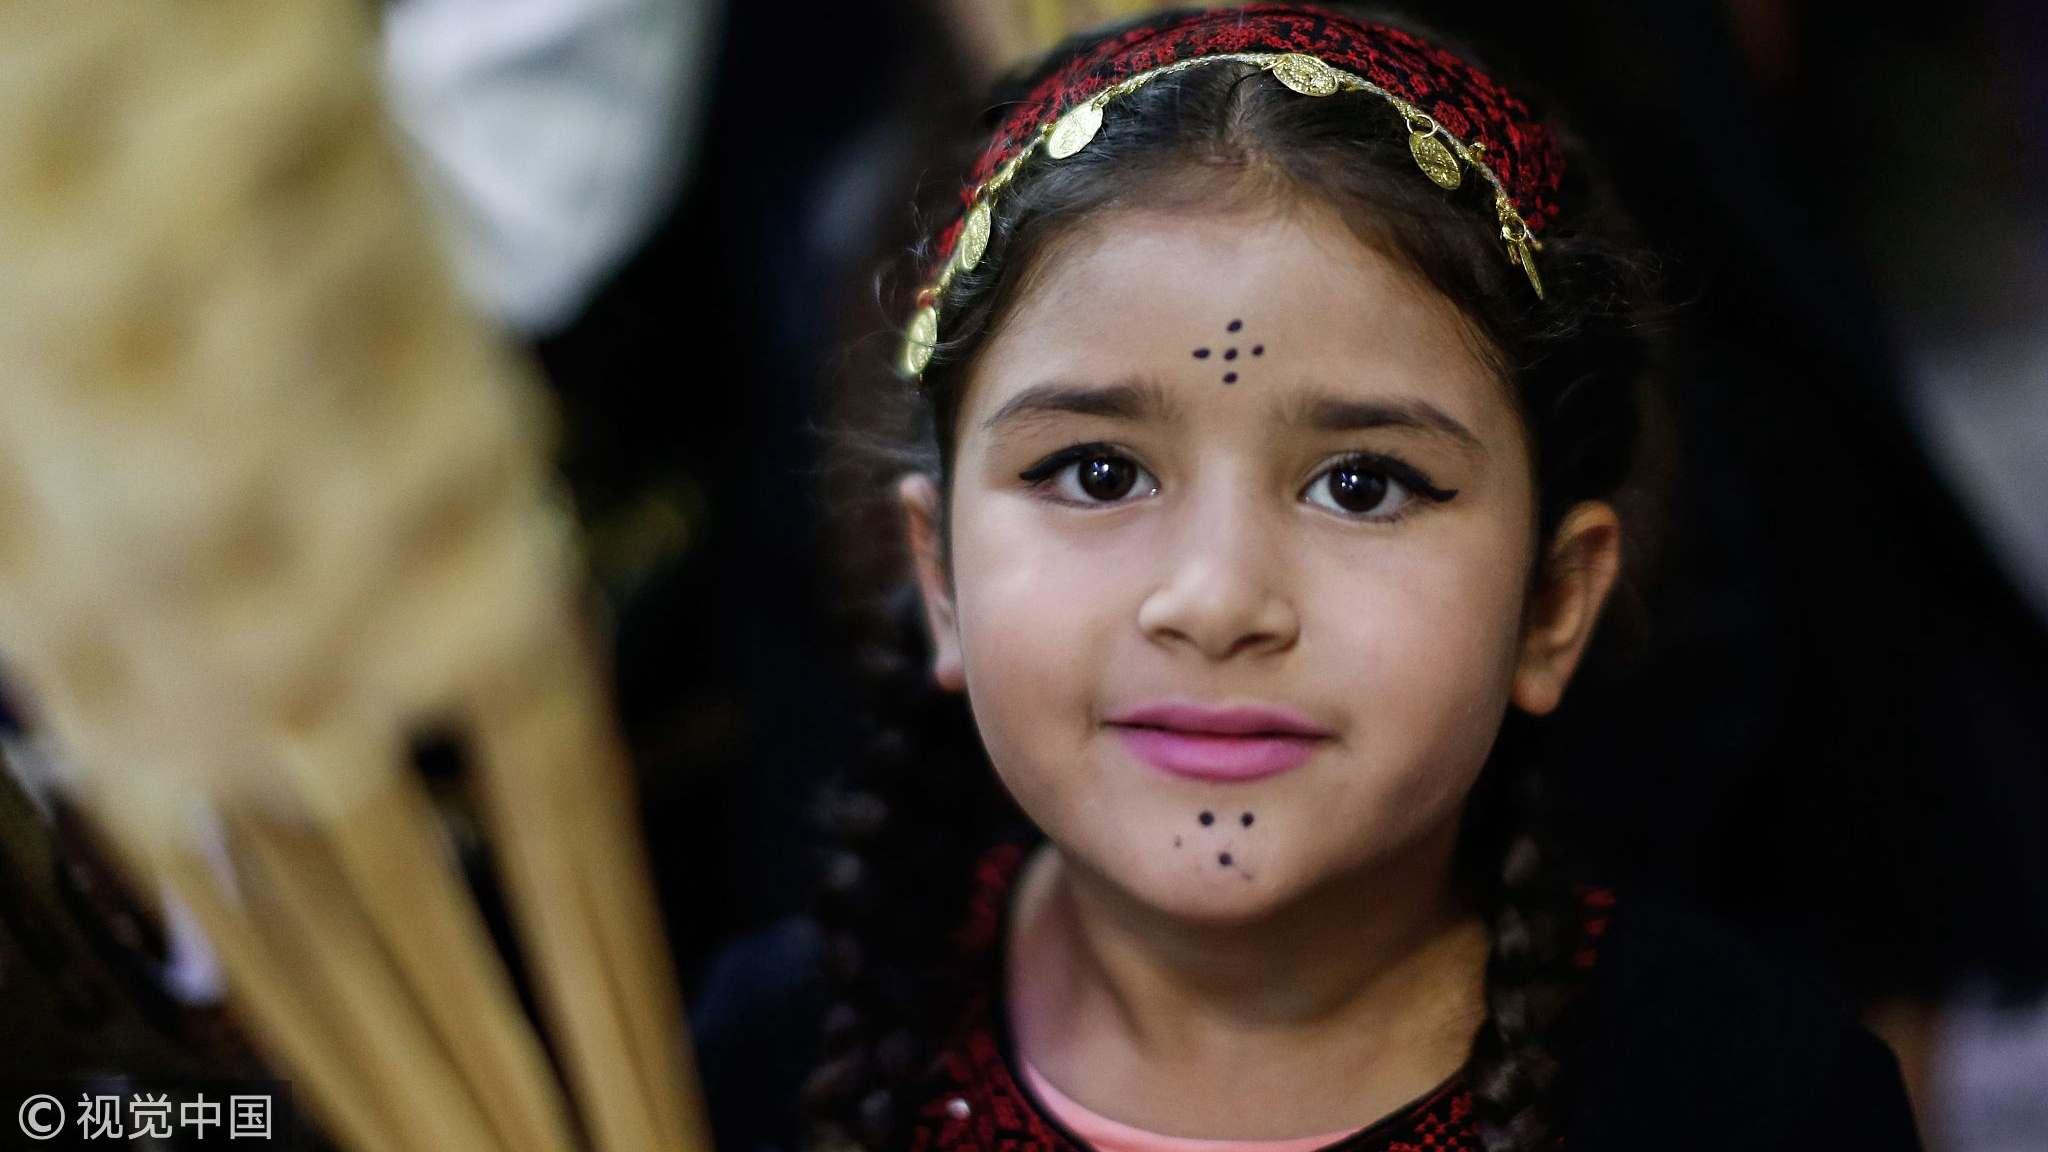 Palestinians celebrated Ramadan in the old city in Jerusalem